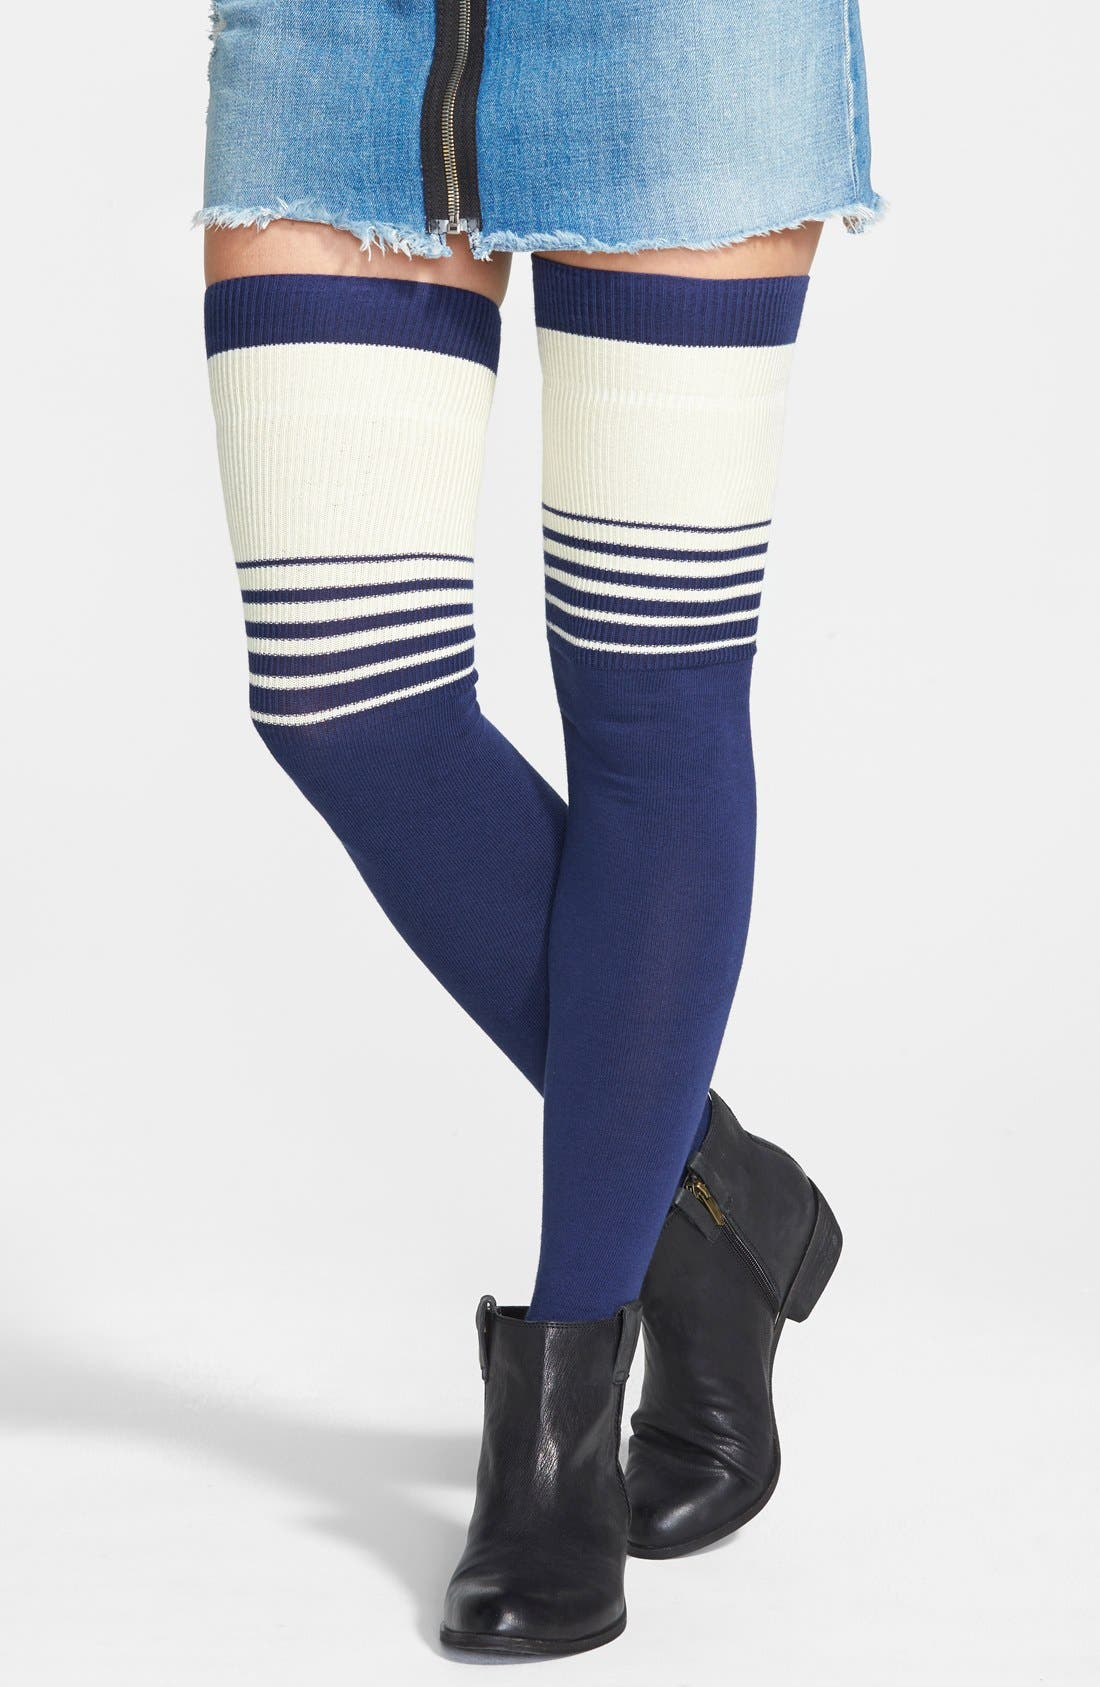 Main Image - Free People 'Bowlers' Thigh High Socks